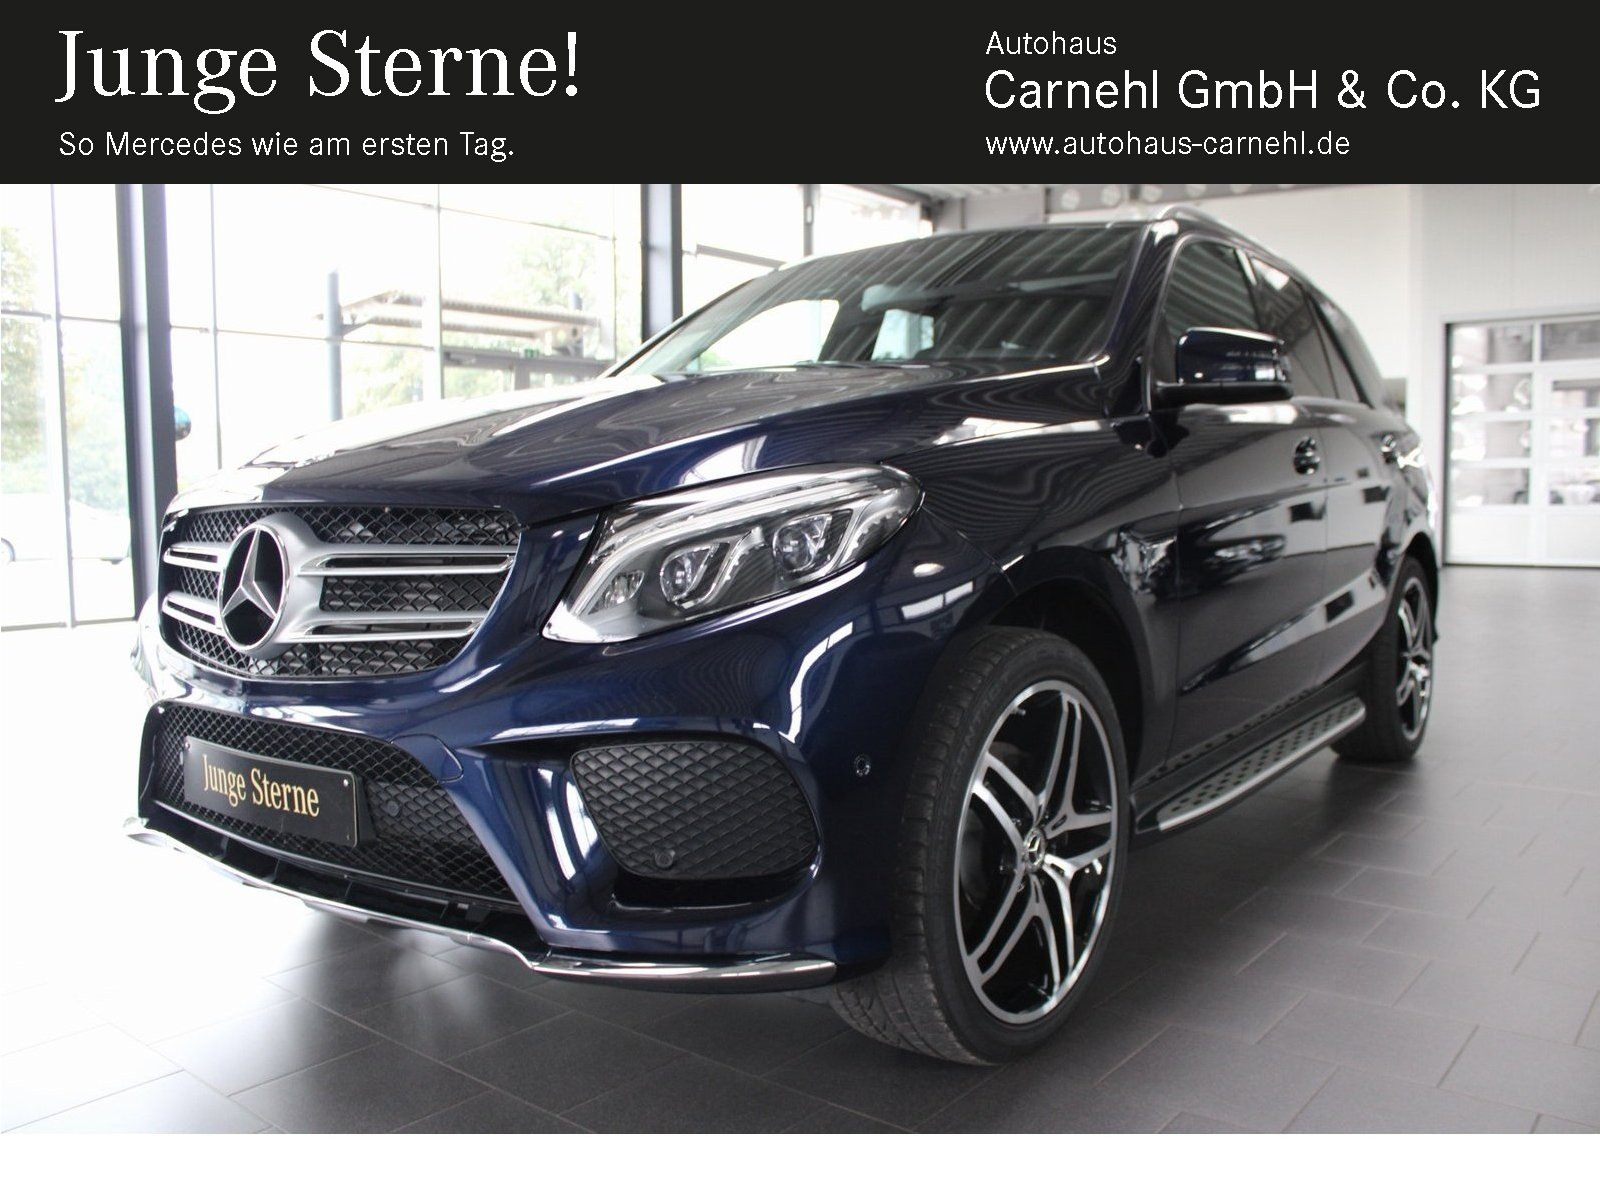 "Mercedes-Benz GLE 250 d AMG+Pano+Airmatic+Comand+21""Alu+Kamera, Jahr 2017, diesel"